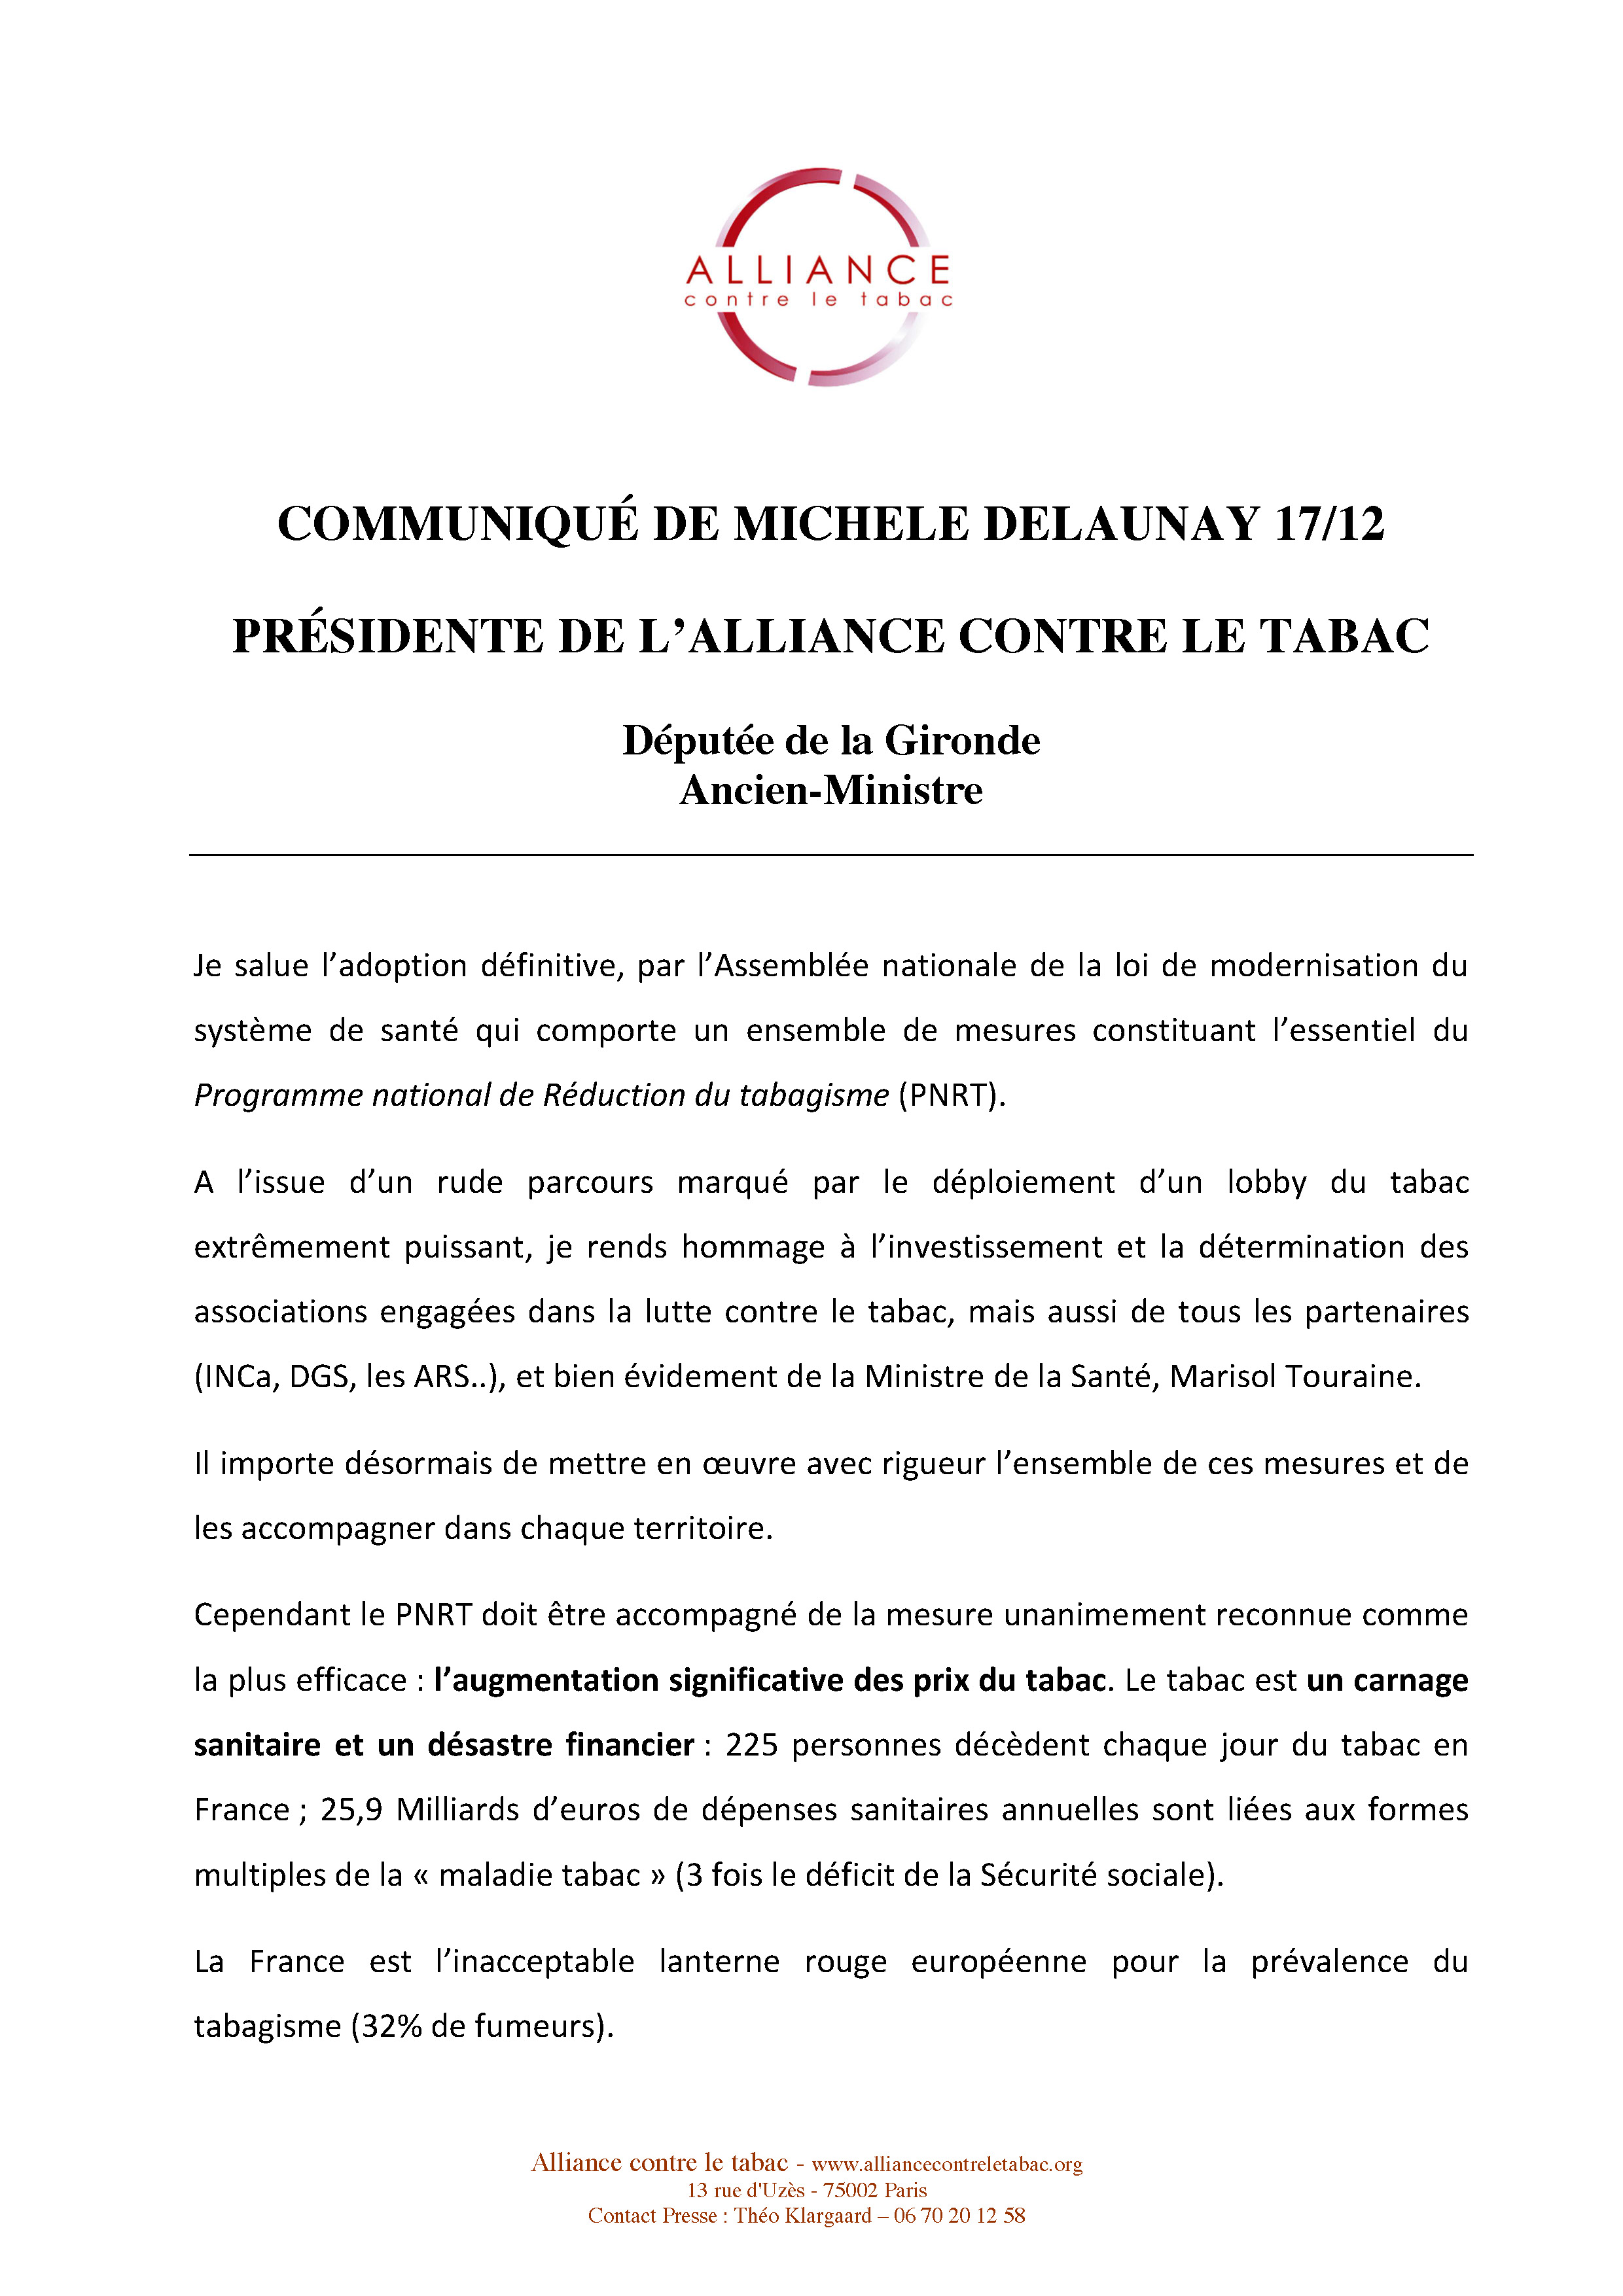 Alliance-CP_loi-de-sante-adoption-definitive_17dec2015.jpg